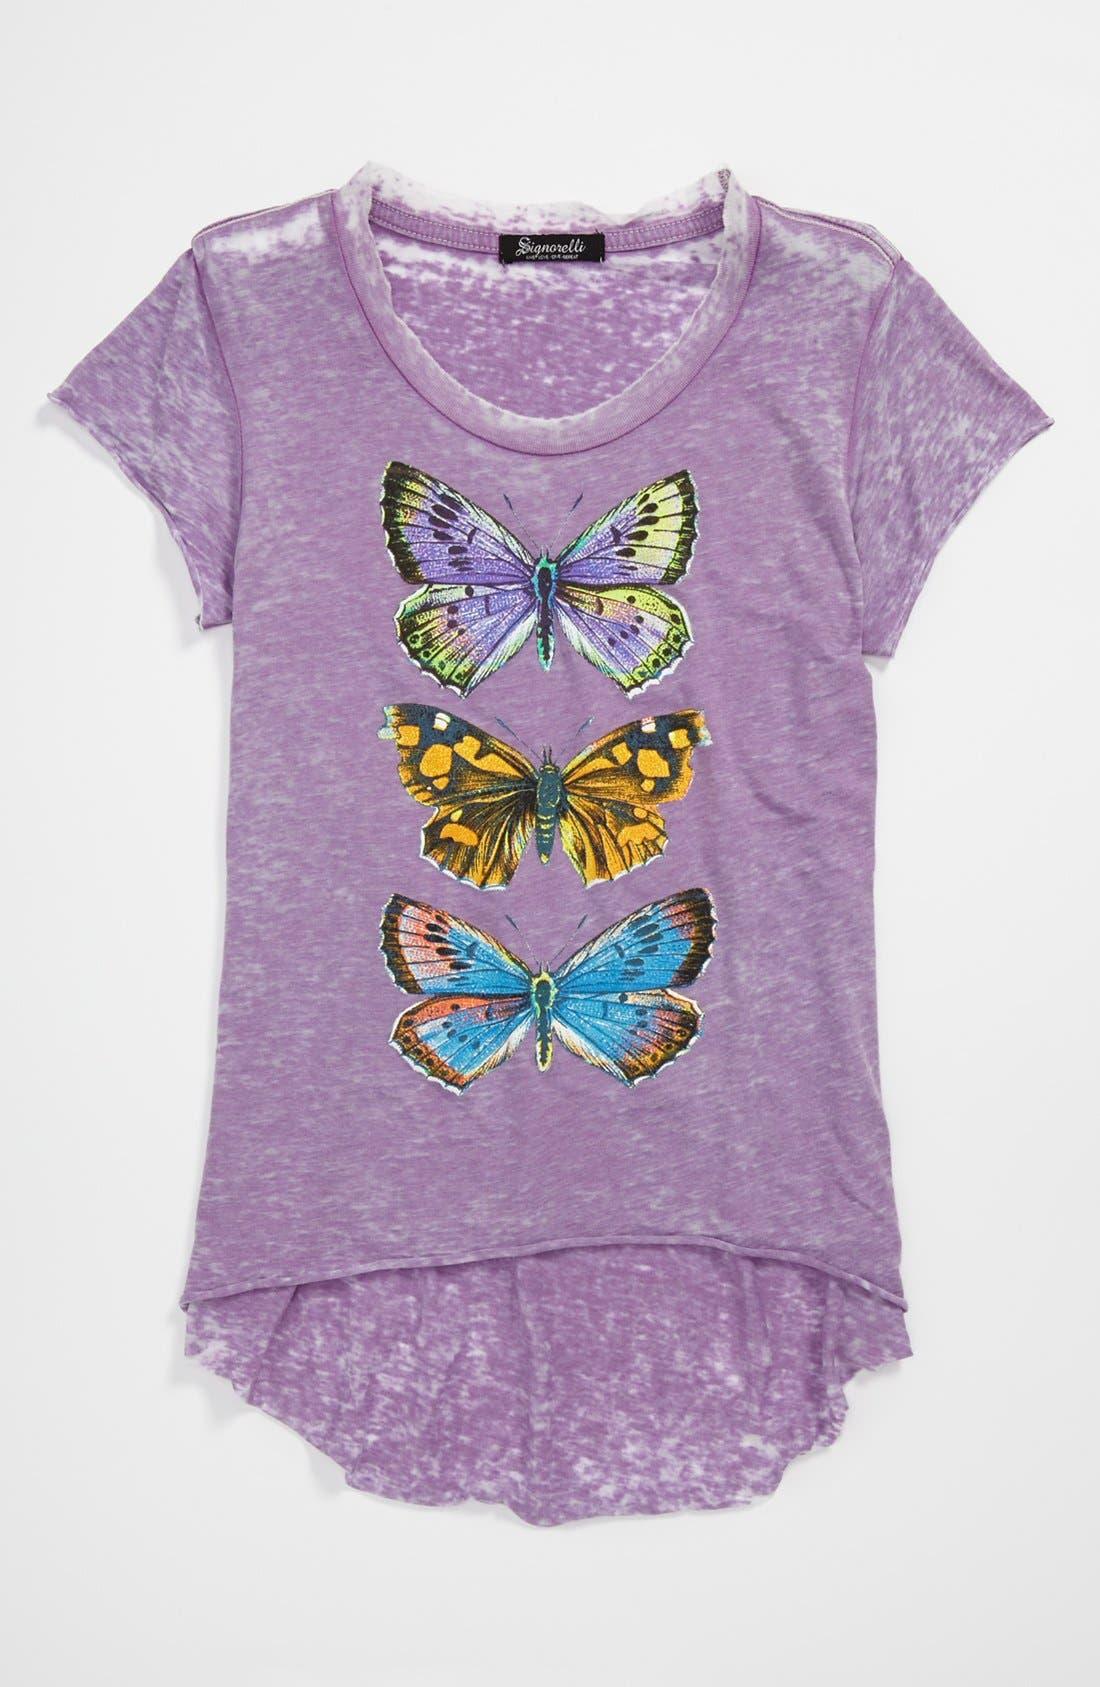 Main Image - Signorelli Butterfly Print Tee (Big Girls)